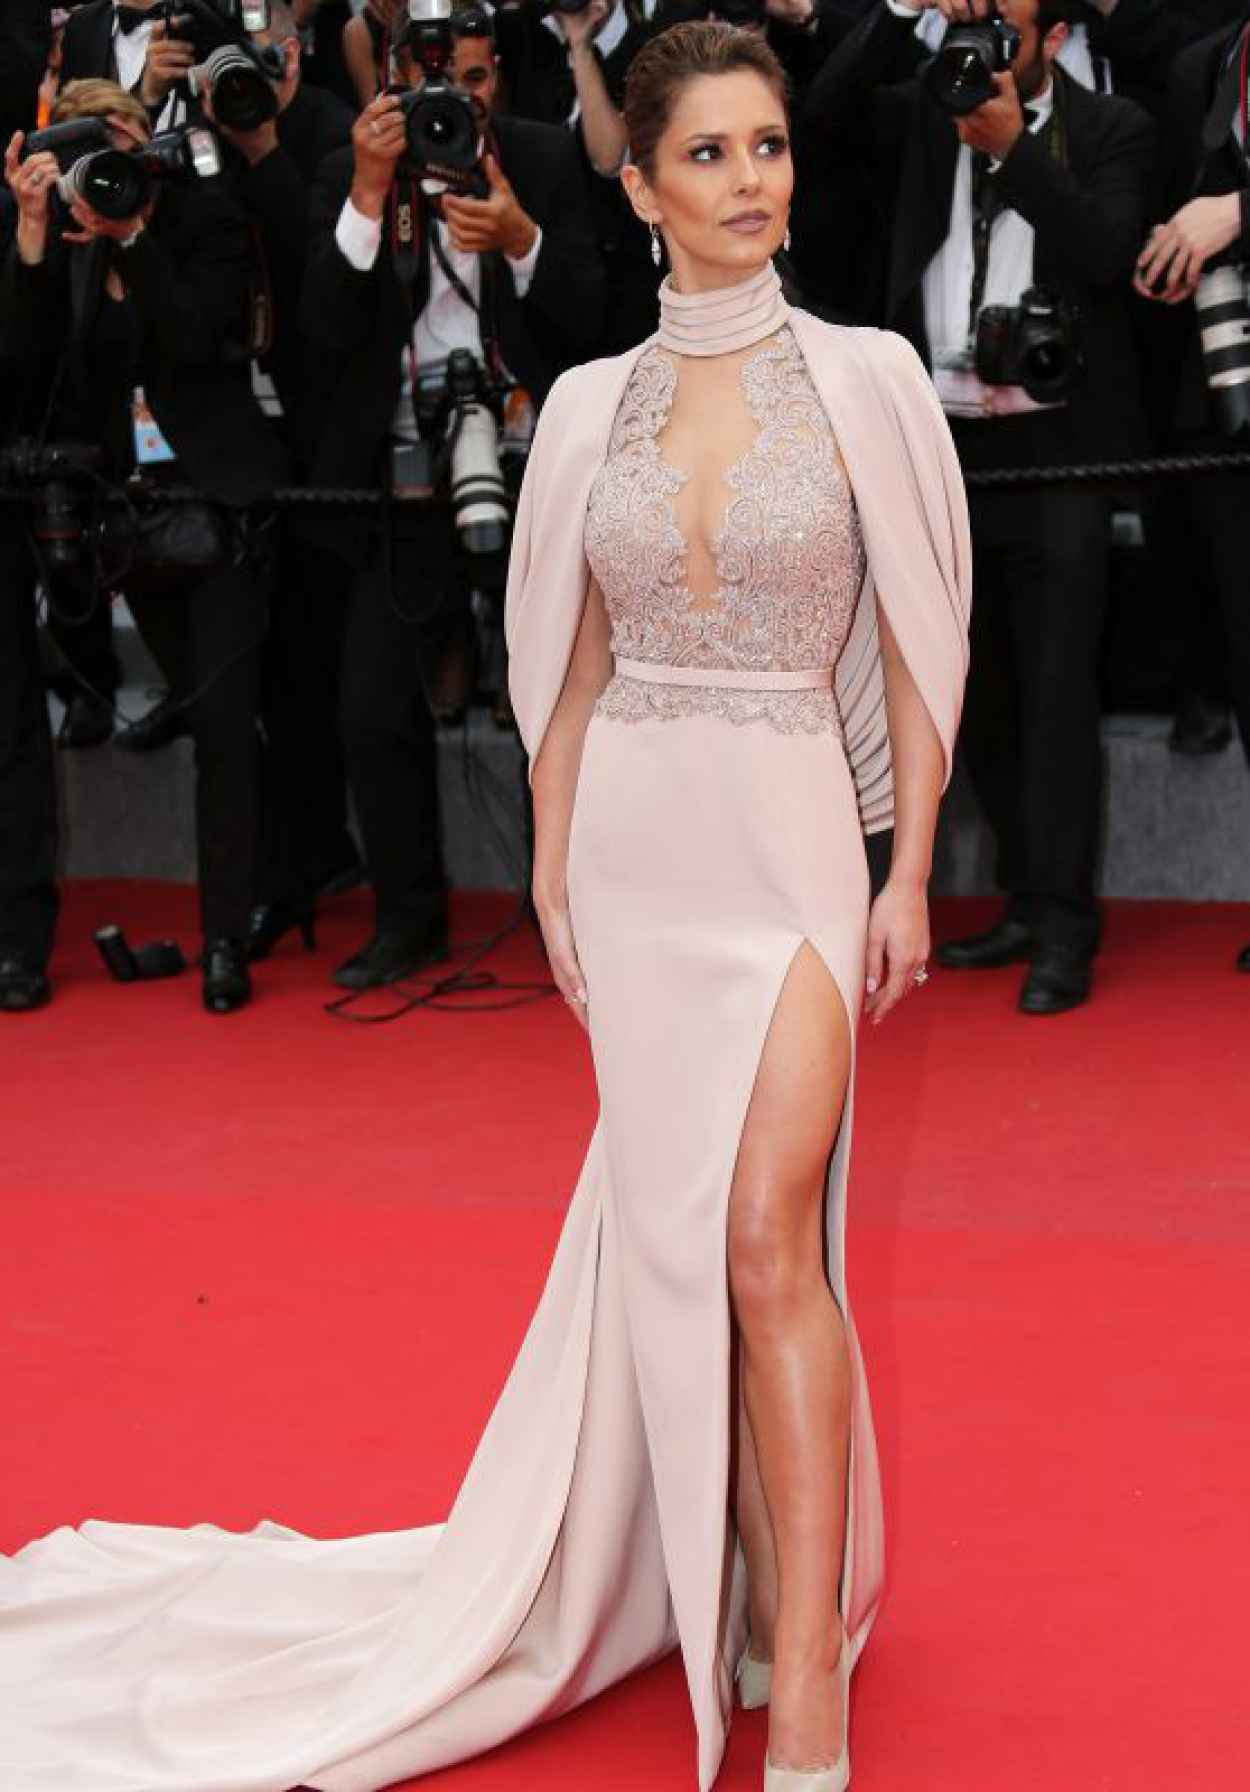 Cheryl Fernandez-Versini - Irrational Man Premiere at 2015 Cannes Film Festival-1